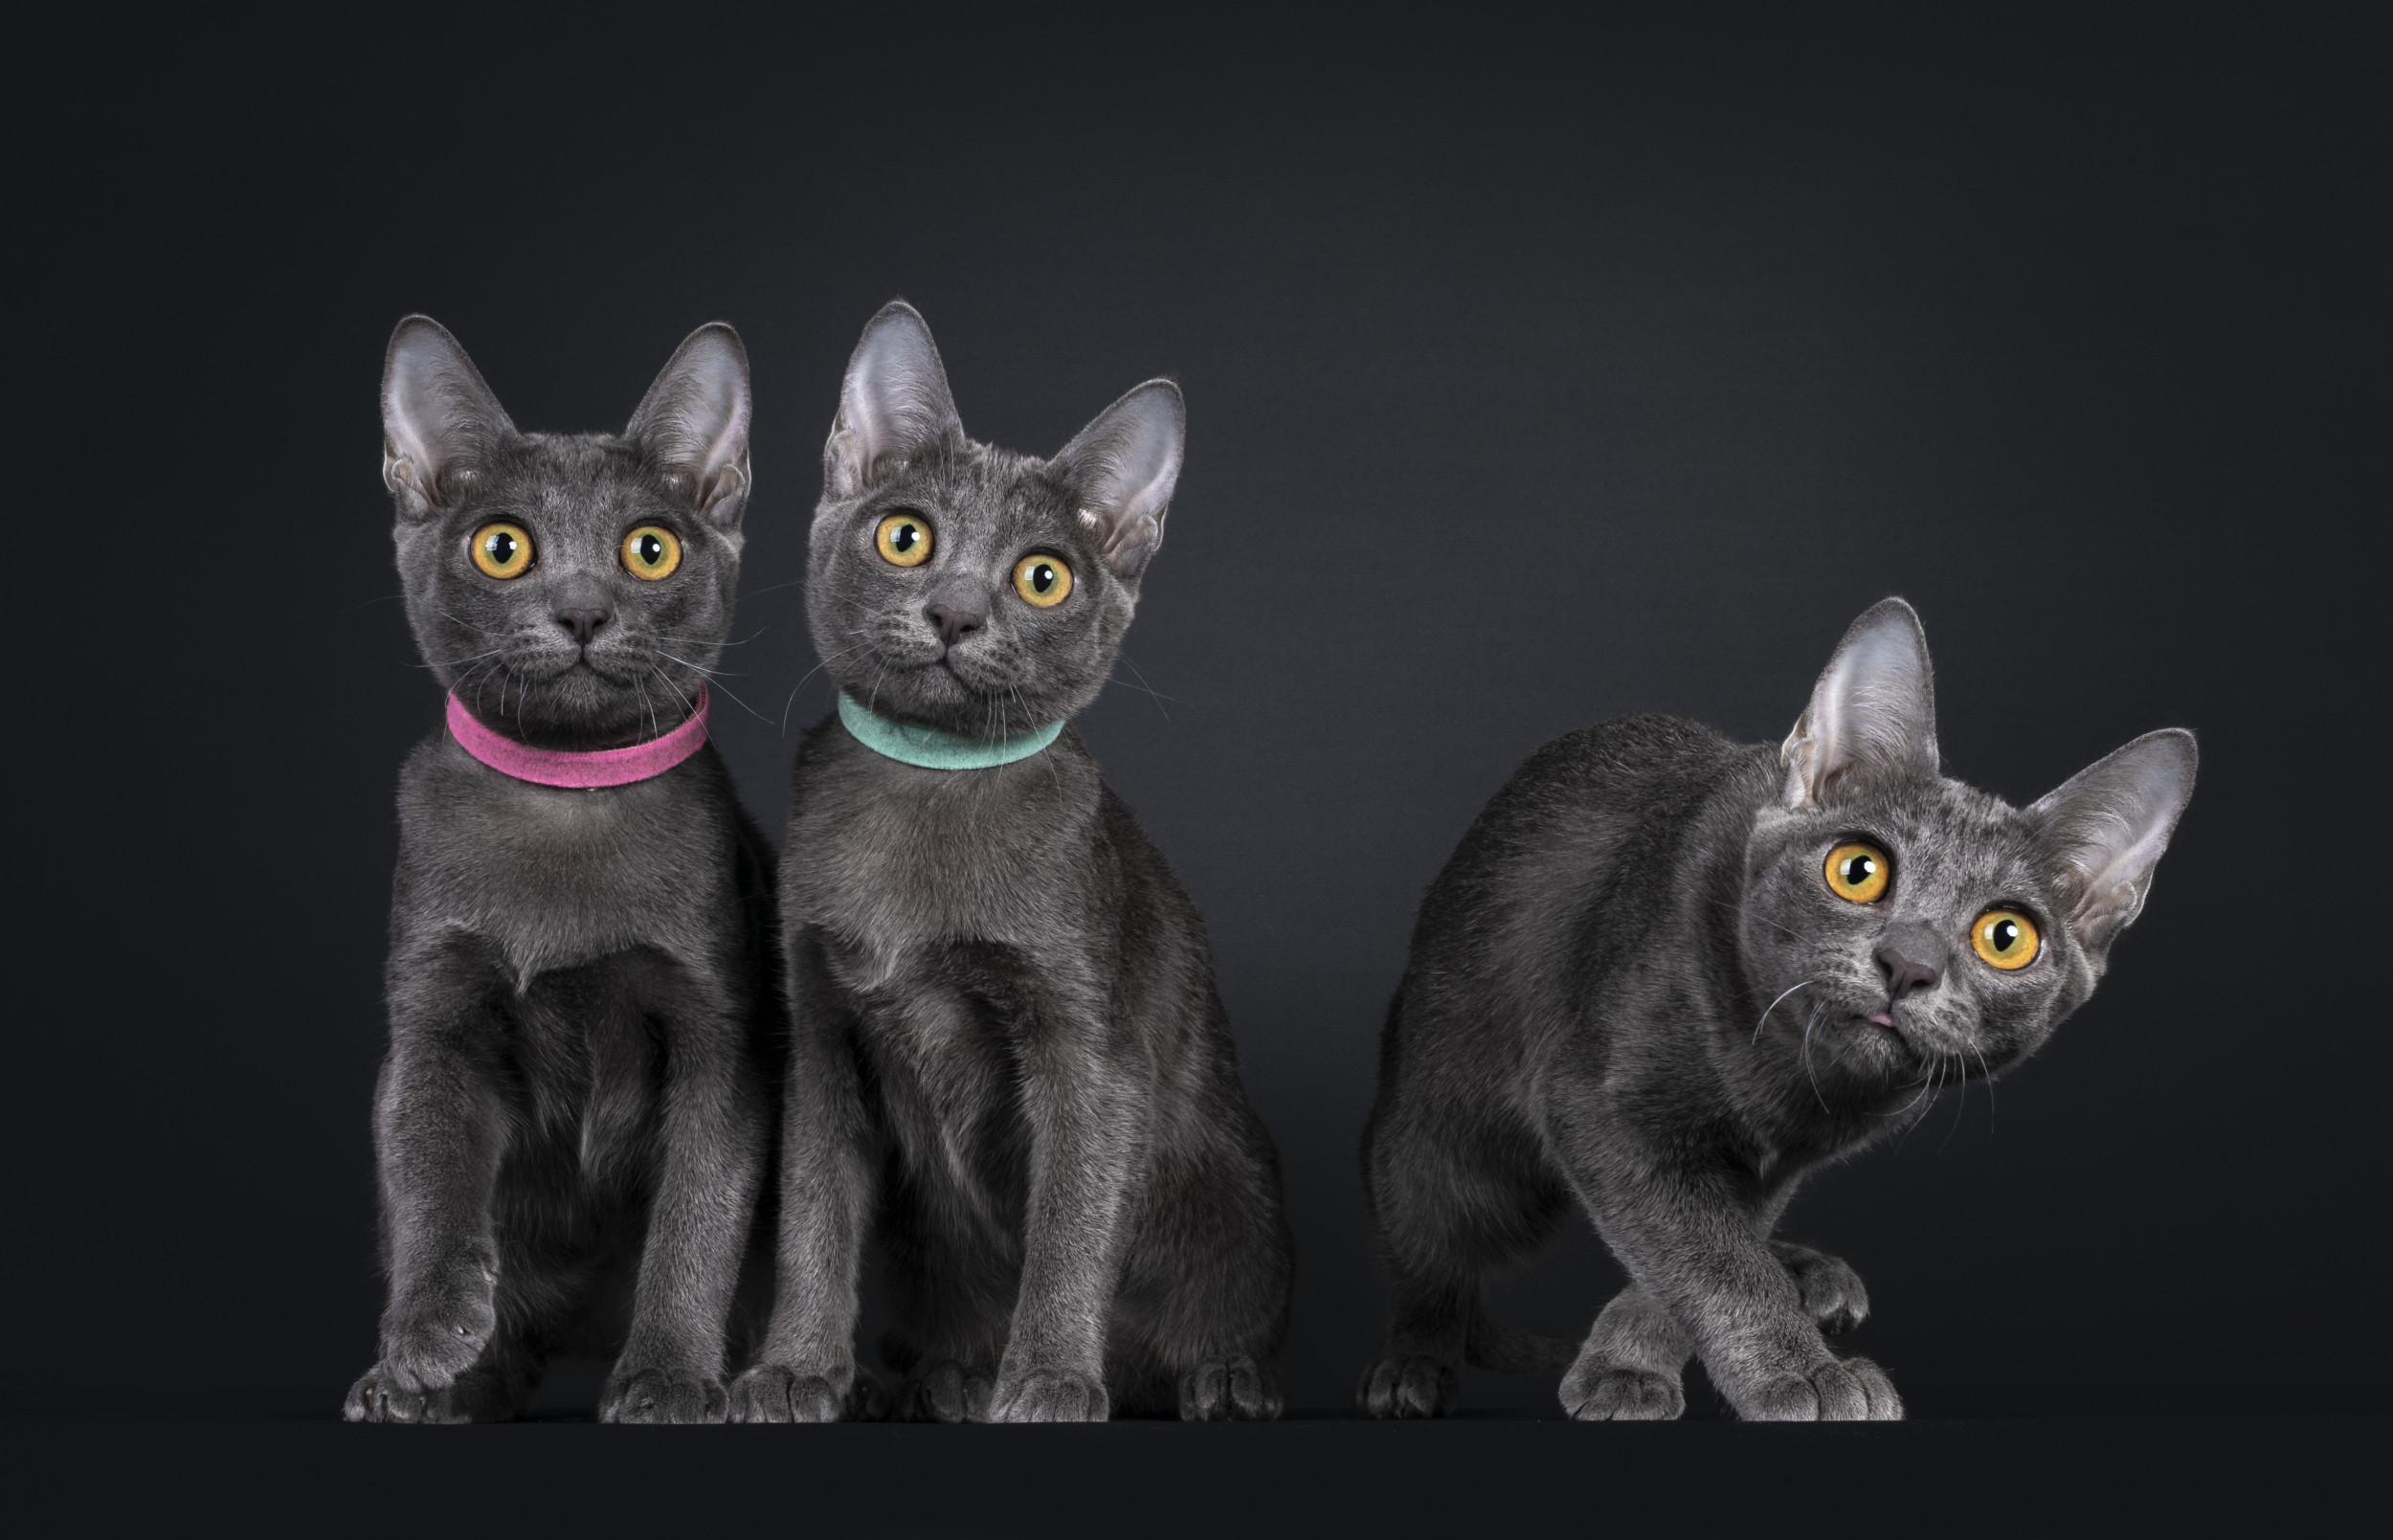 14 of the Rarest Cat Breeds